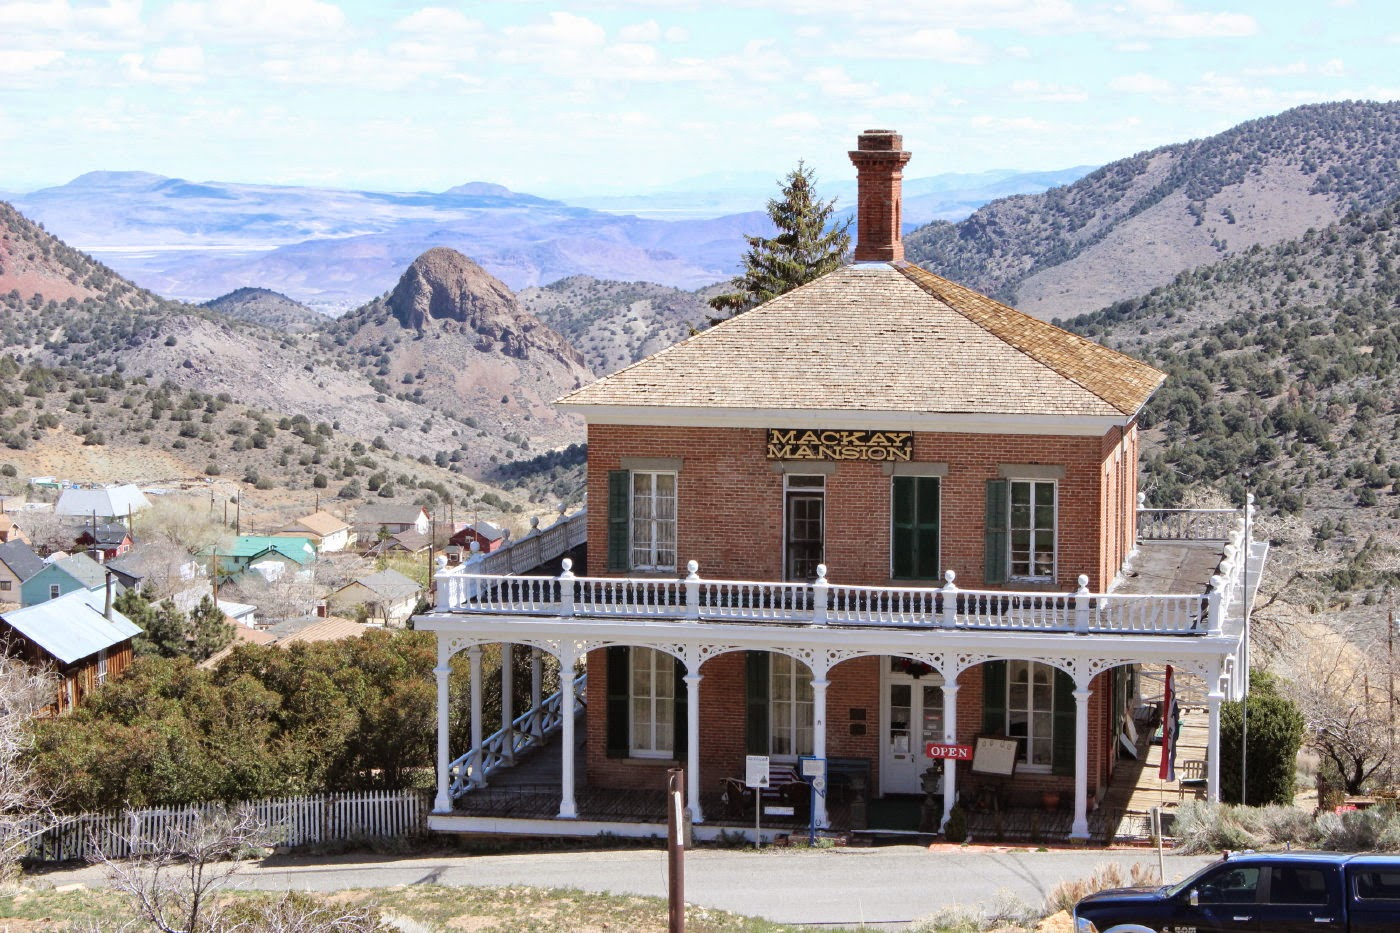 J And B Lady Blue Virginia City Nevada